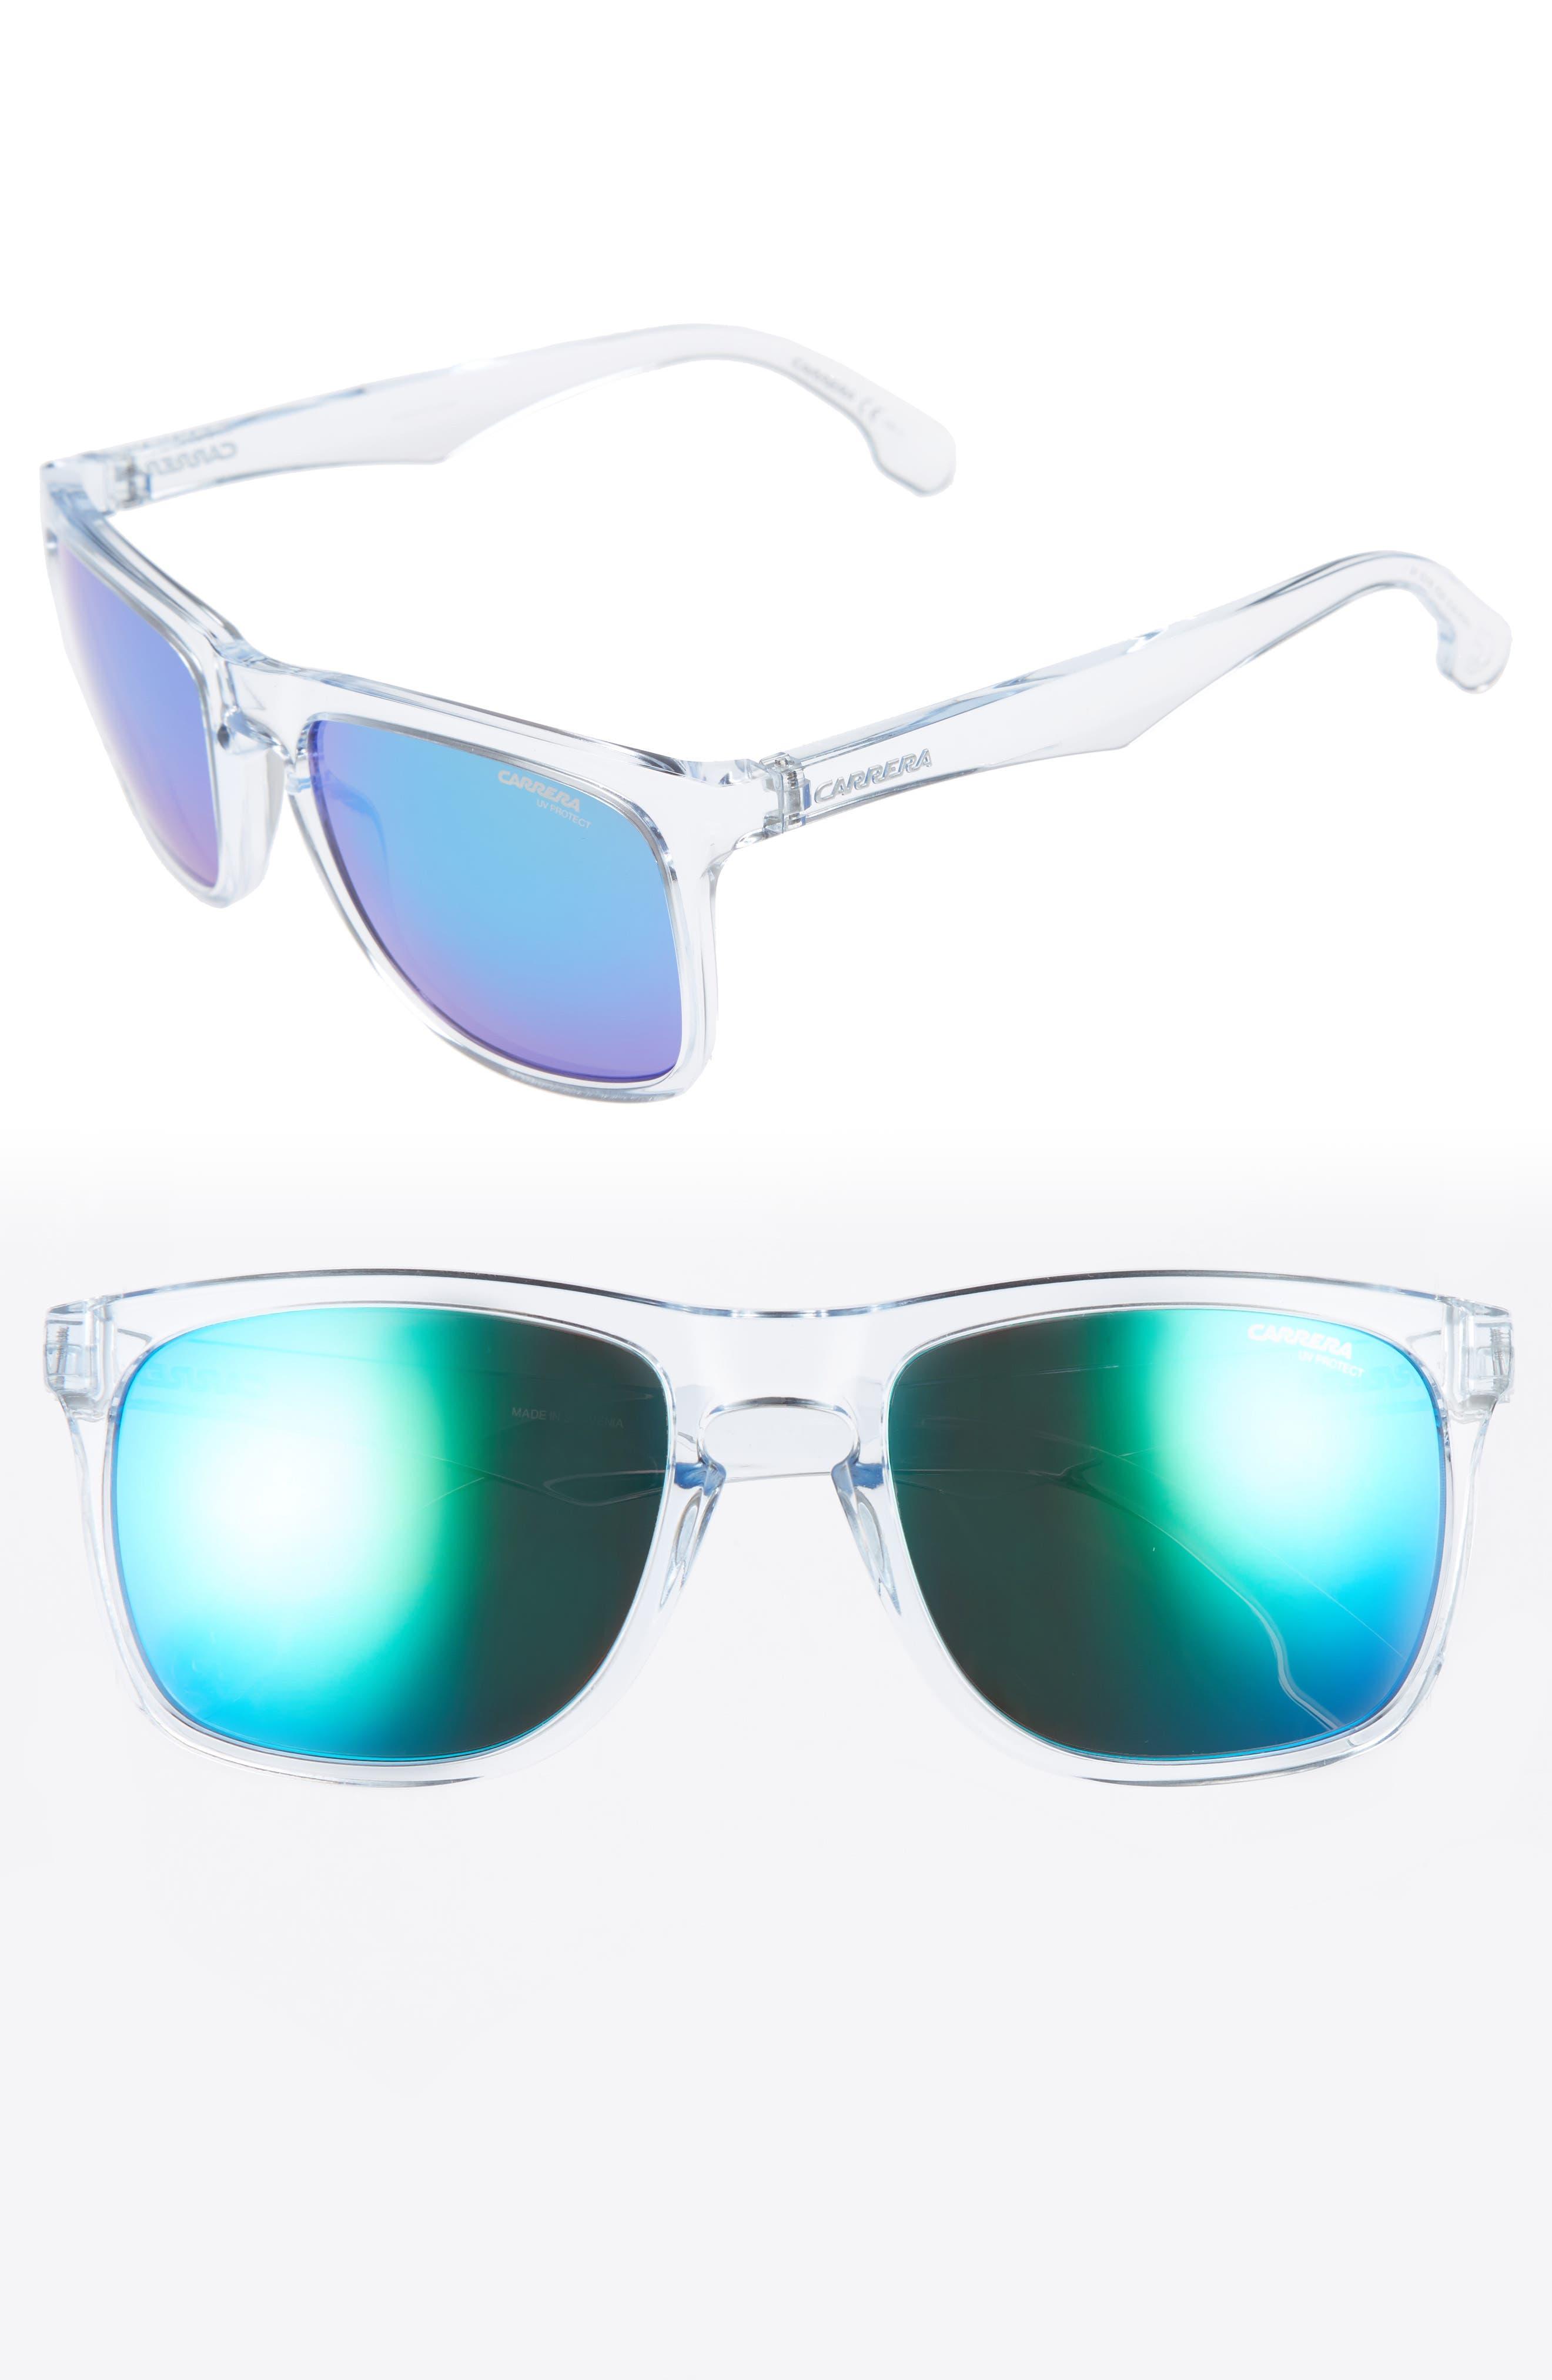 Main Image - Carrera Eyewear 56mm Mirrored Lens Sunglasses